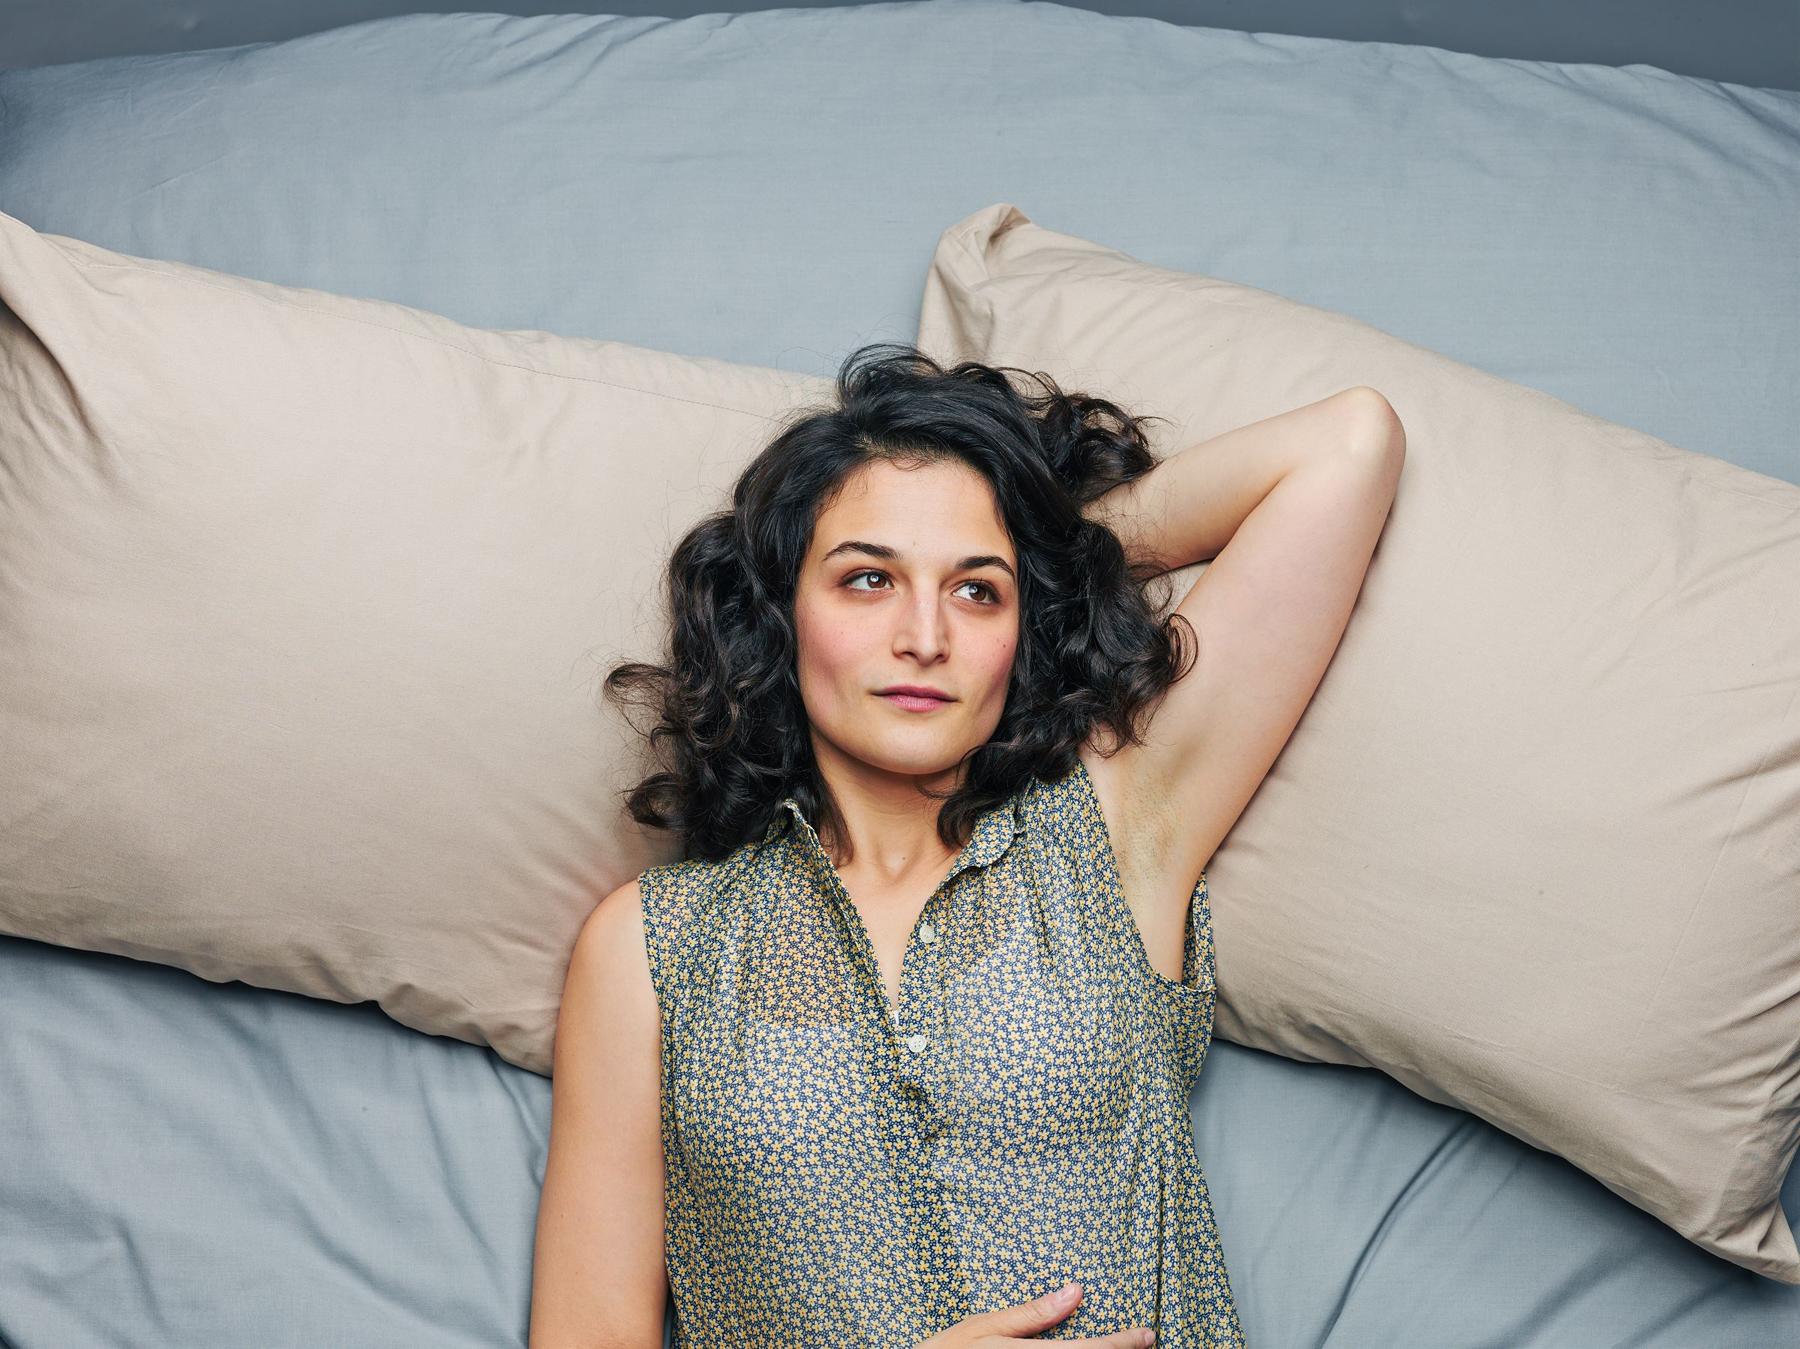 Big girl sex stories sinhala